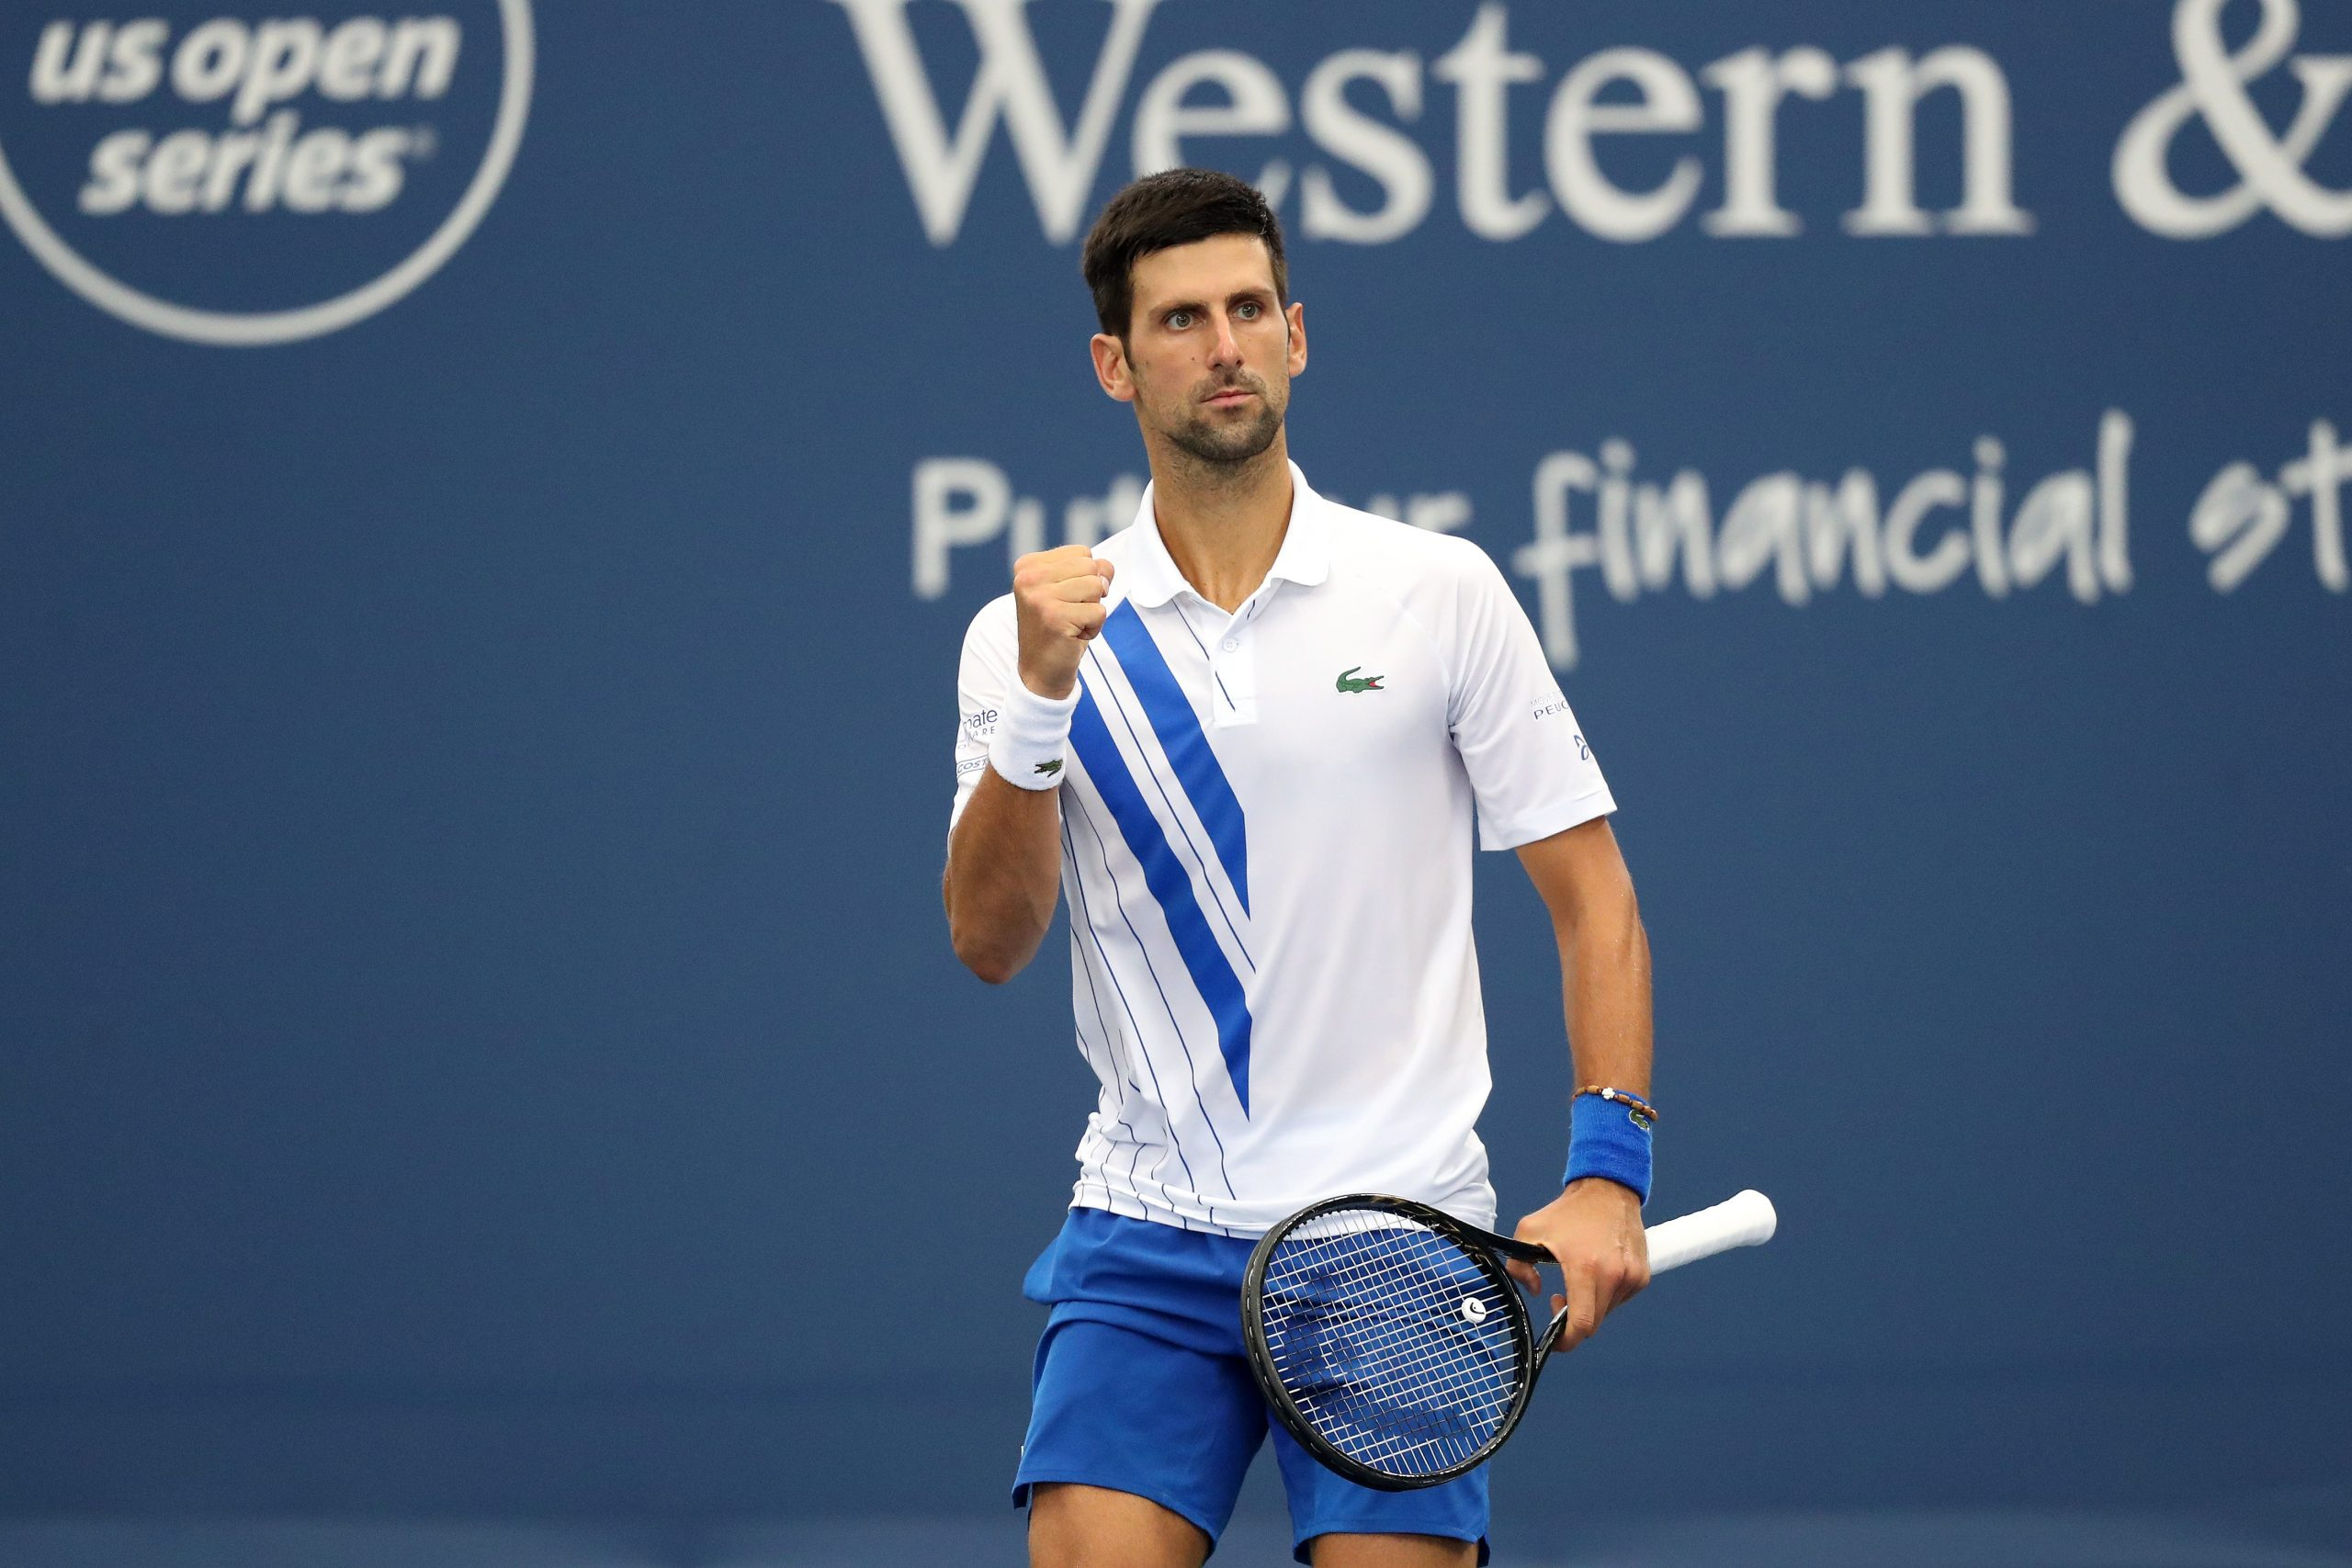 Why Novak Djokovic Was Disqualified From the U.S. Open